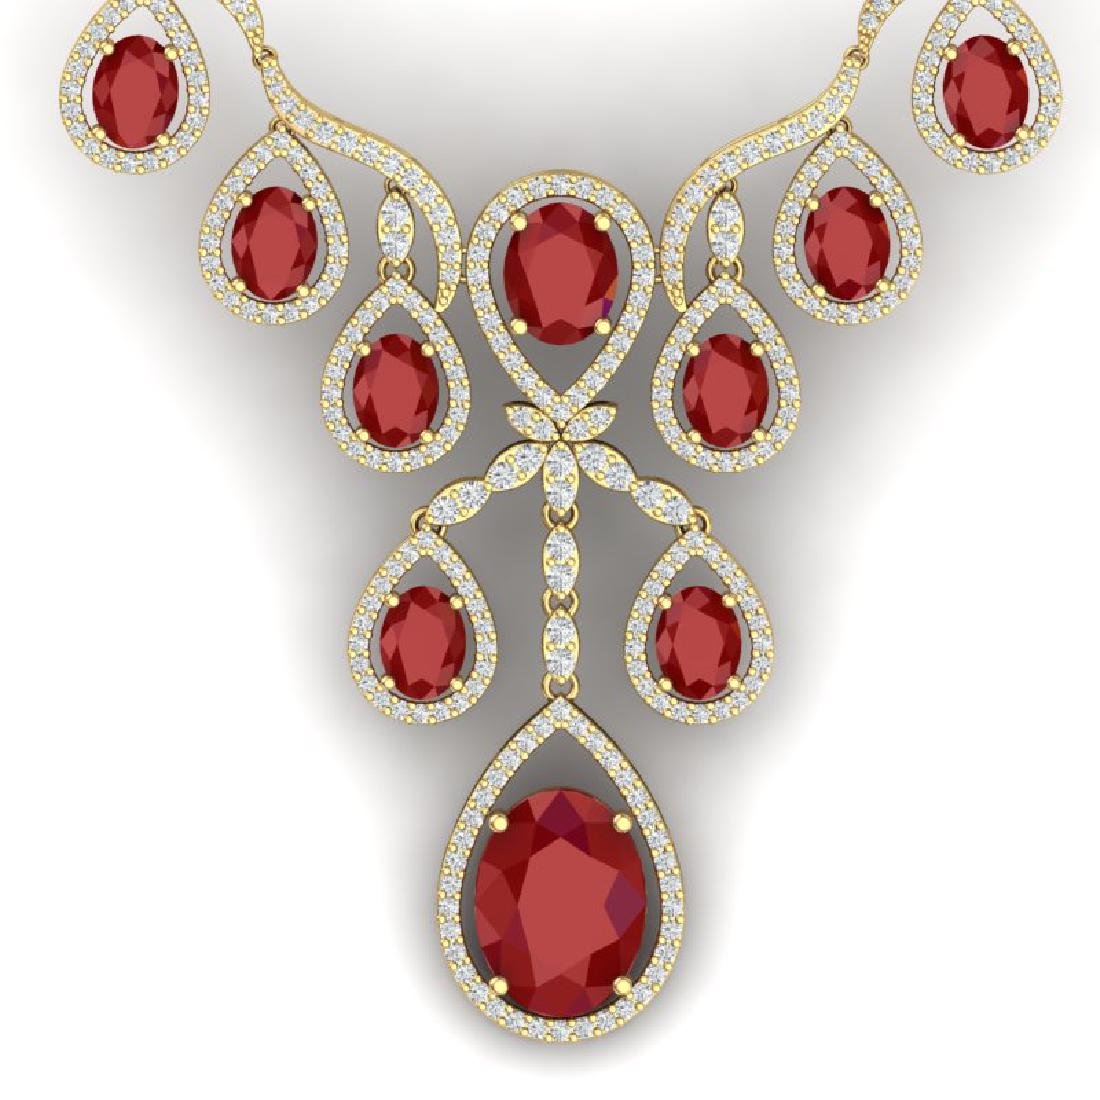 37.66 CTW Royalty Ruby & VS Diamond Necklace 18K Yellow